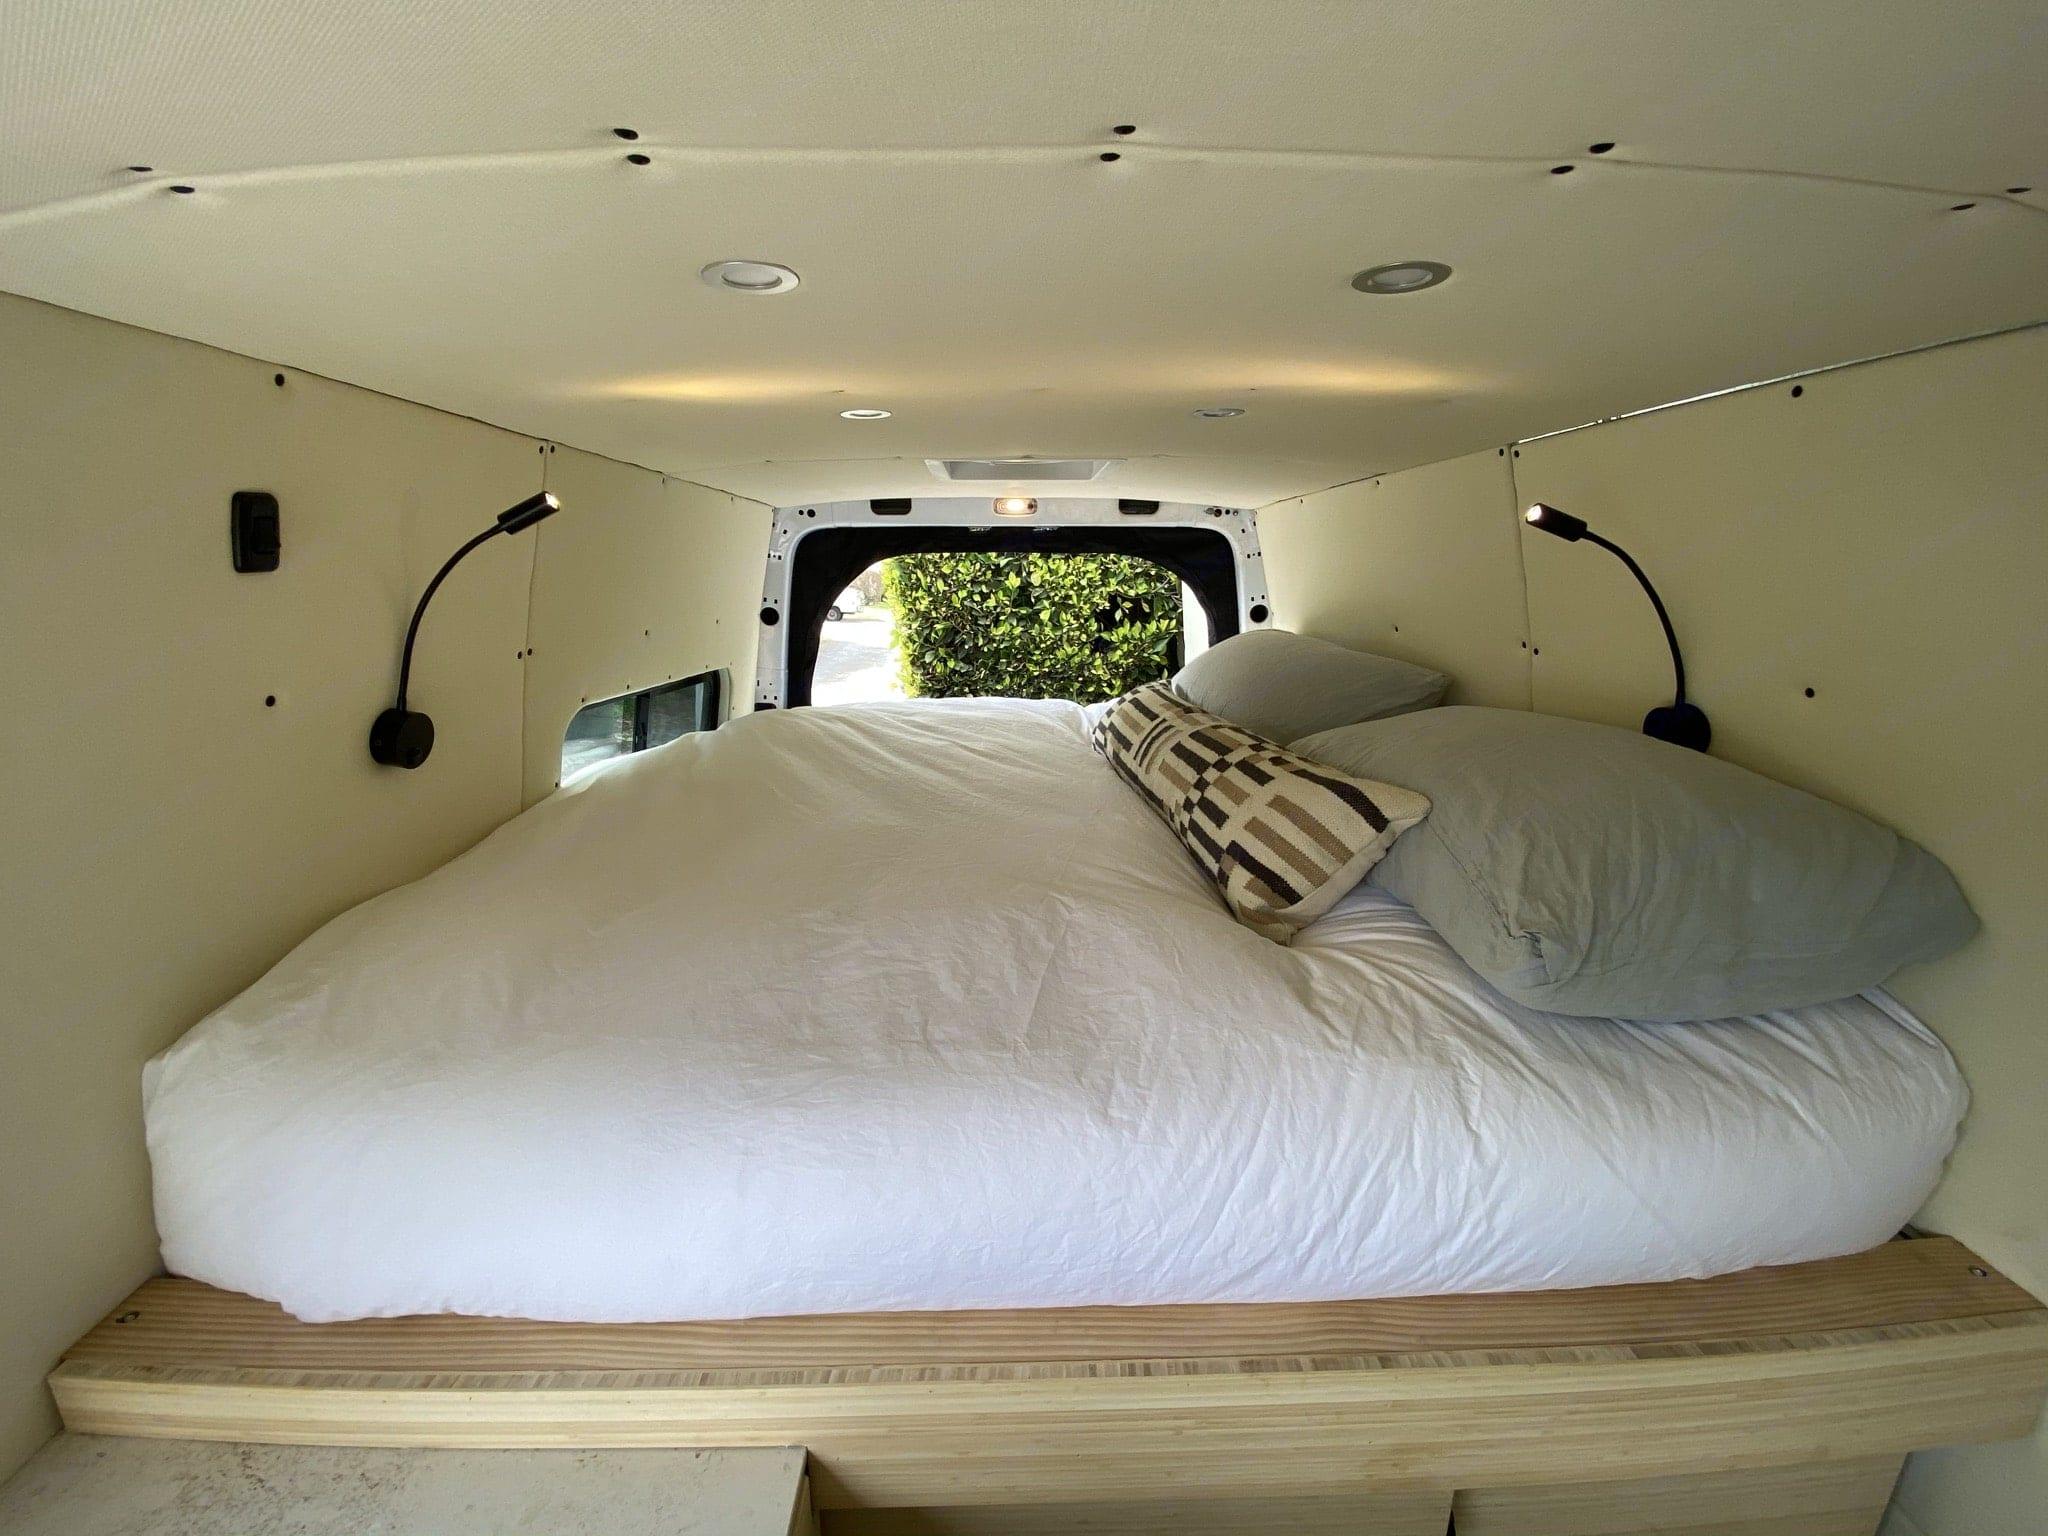 Cozy, custom queen mattress. Mercedes-Benz 4x4 Sprinter mwb 2019